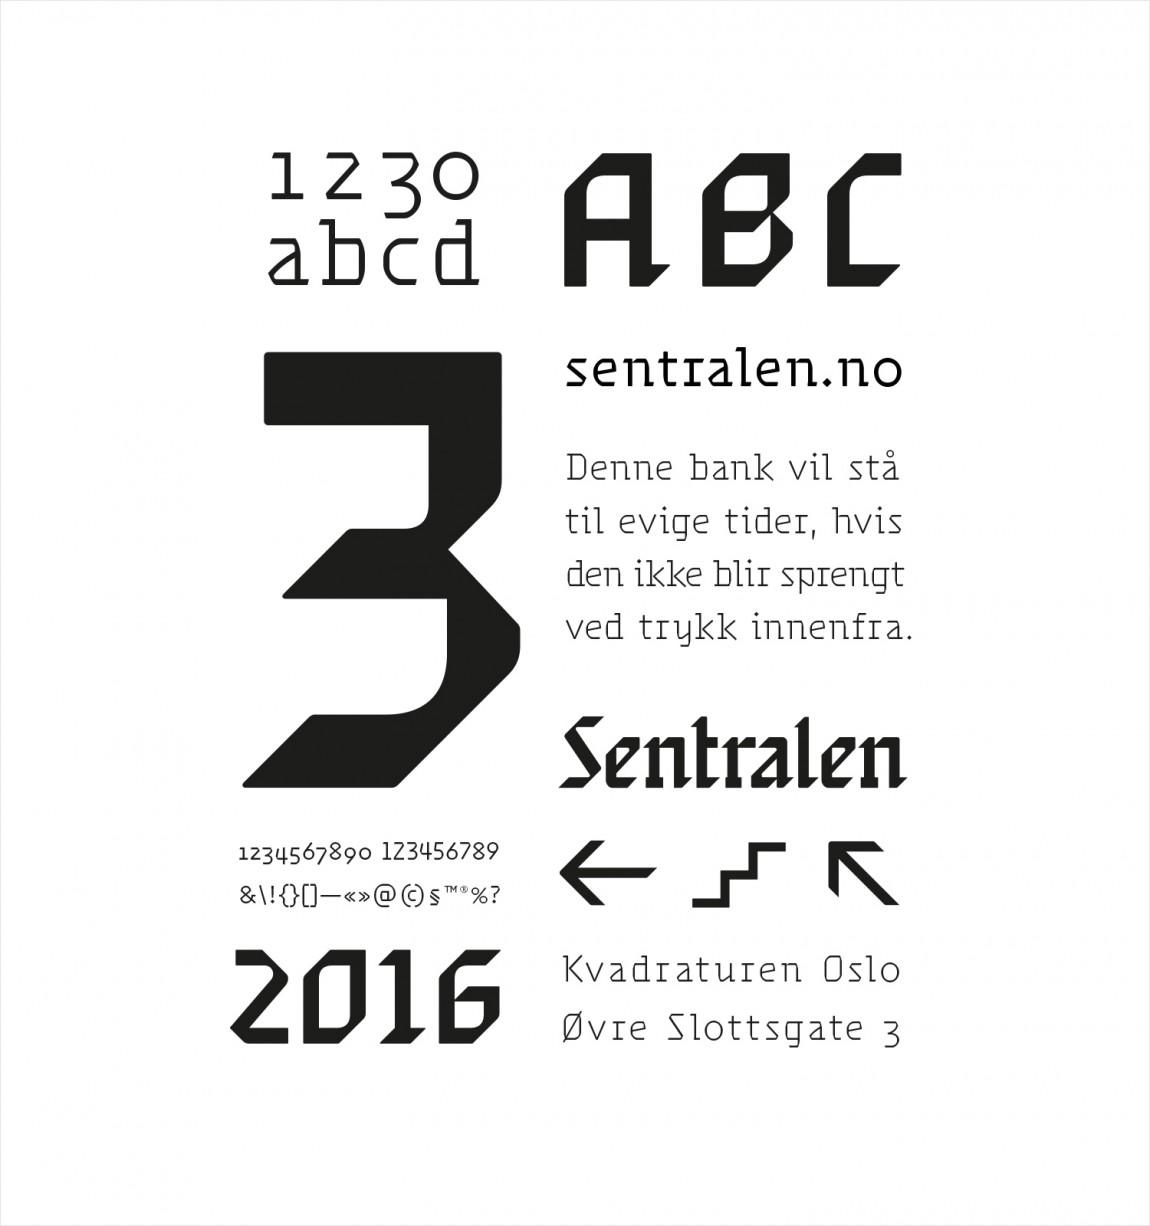 Sentralen文化中心vi企业形象设计, 海报设计